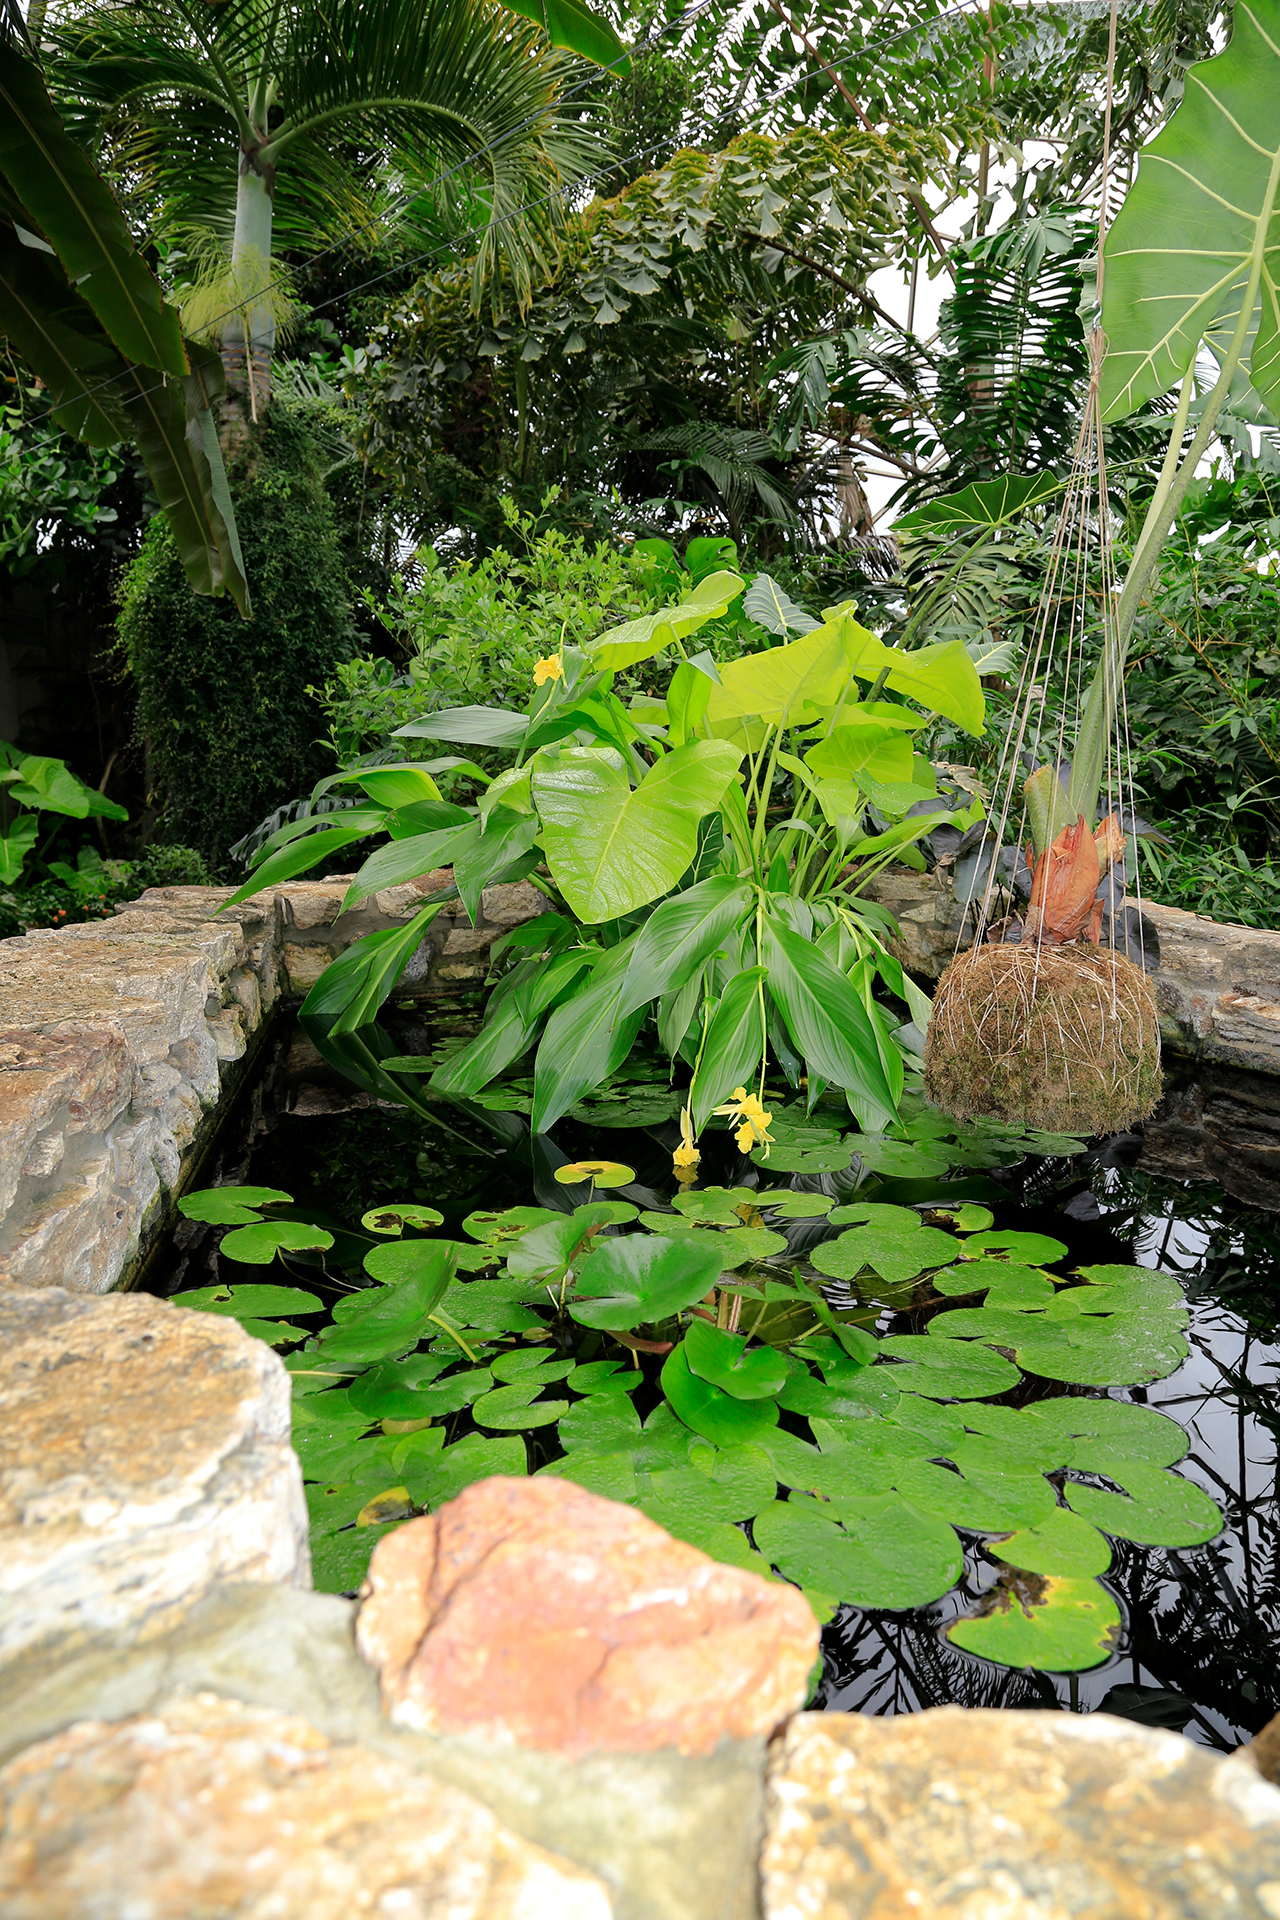 Greater Des Moines Botanical Garden. Photo By Raj H.